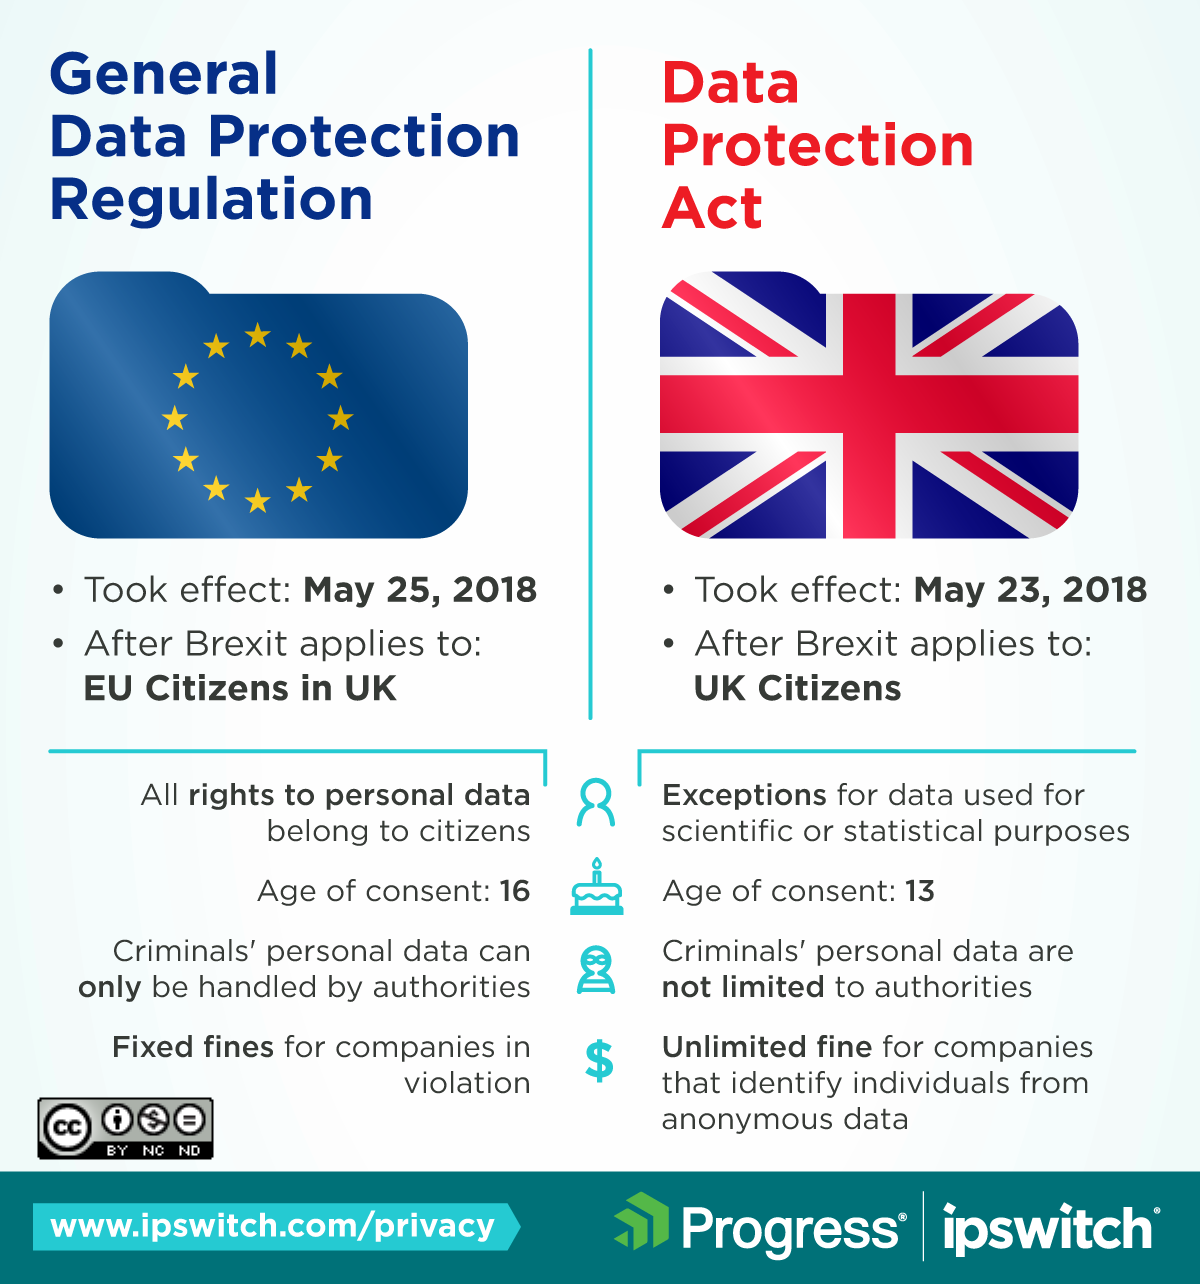 IG-privacy-GDPRvDPA